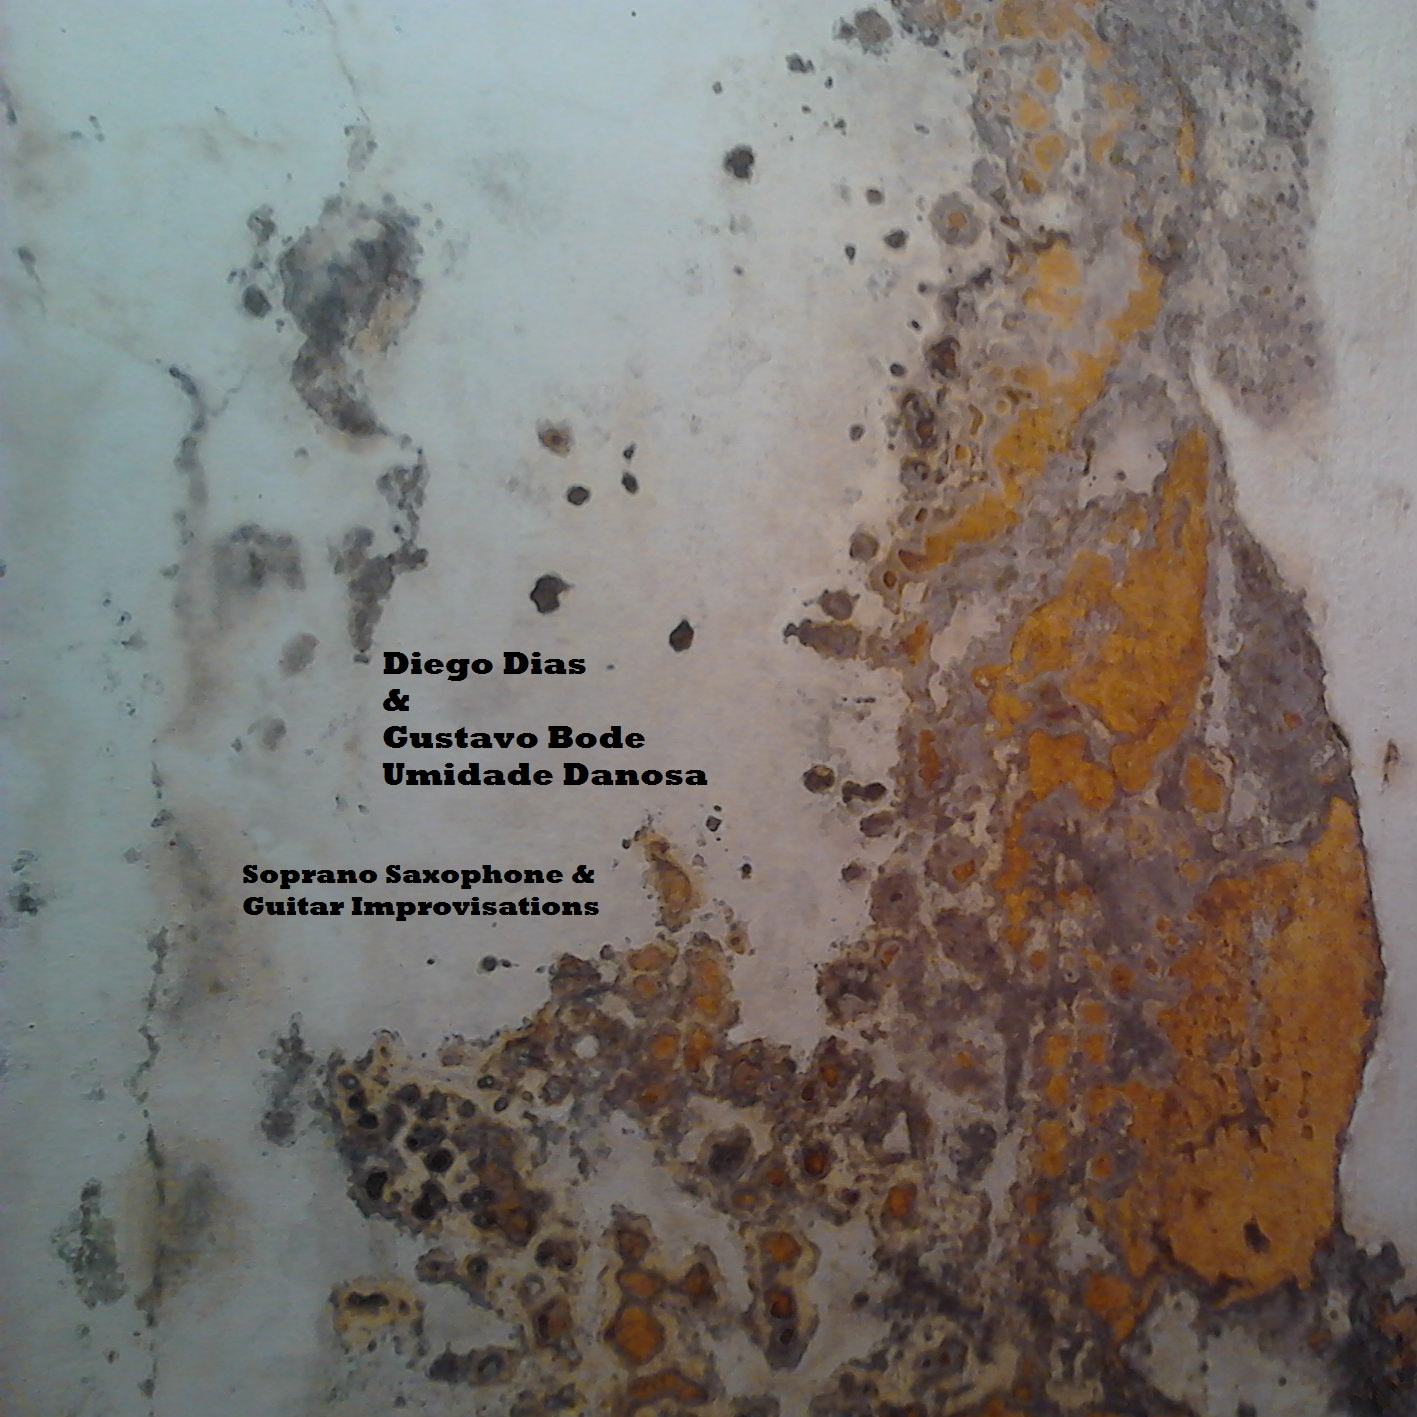 MSRCD019 - Diego Dias & Gustavo Bode - Umidade Danosa